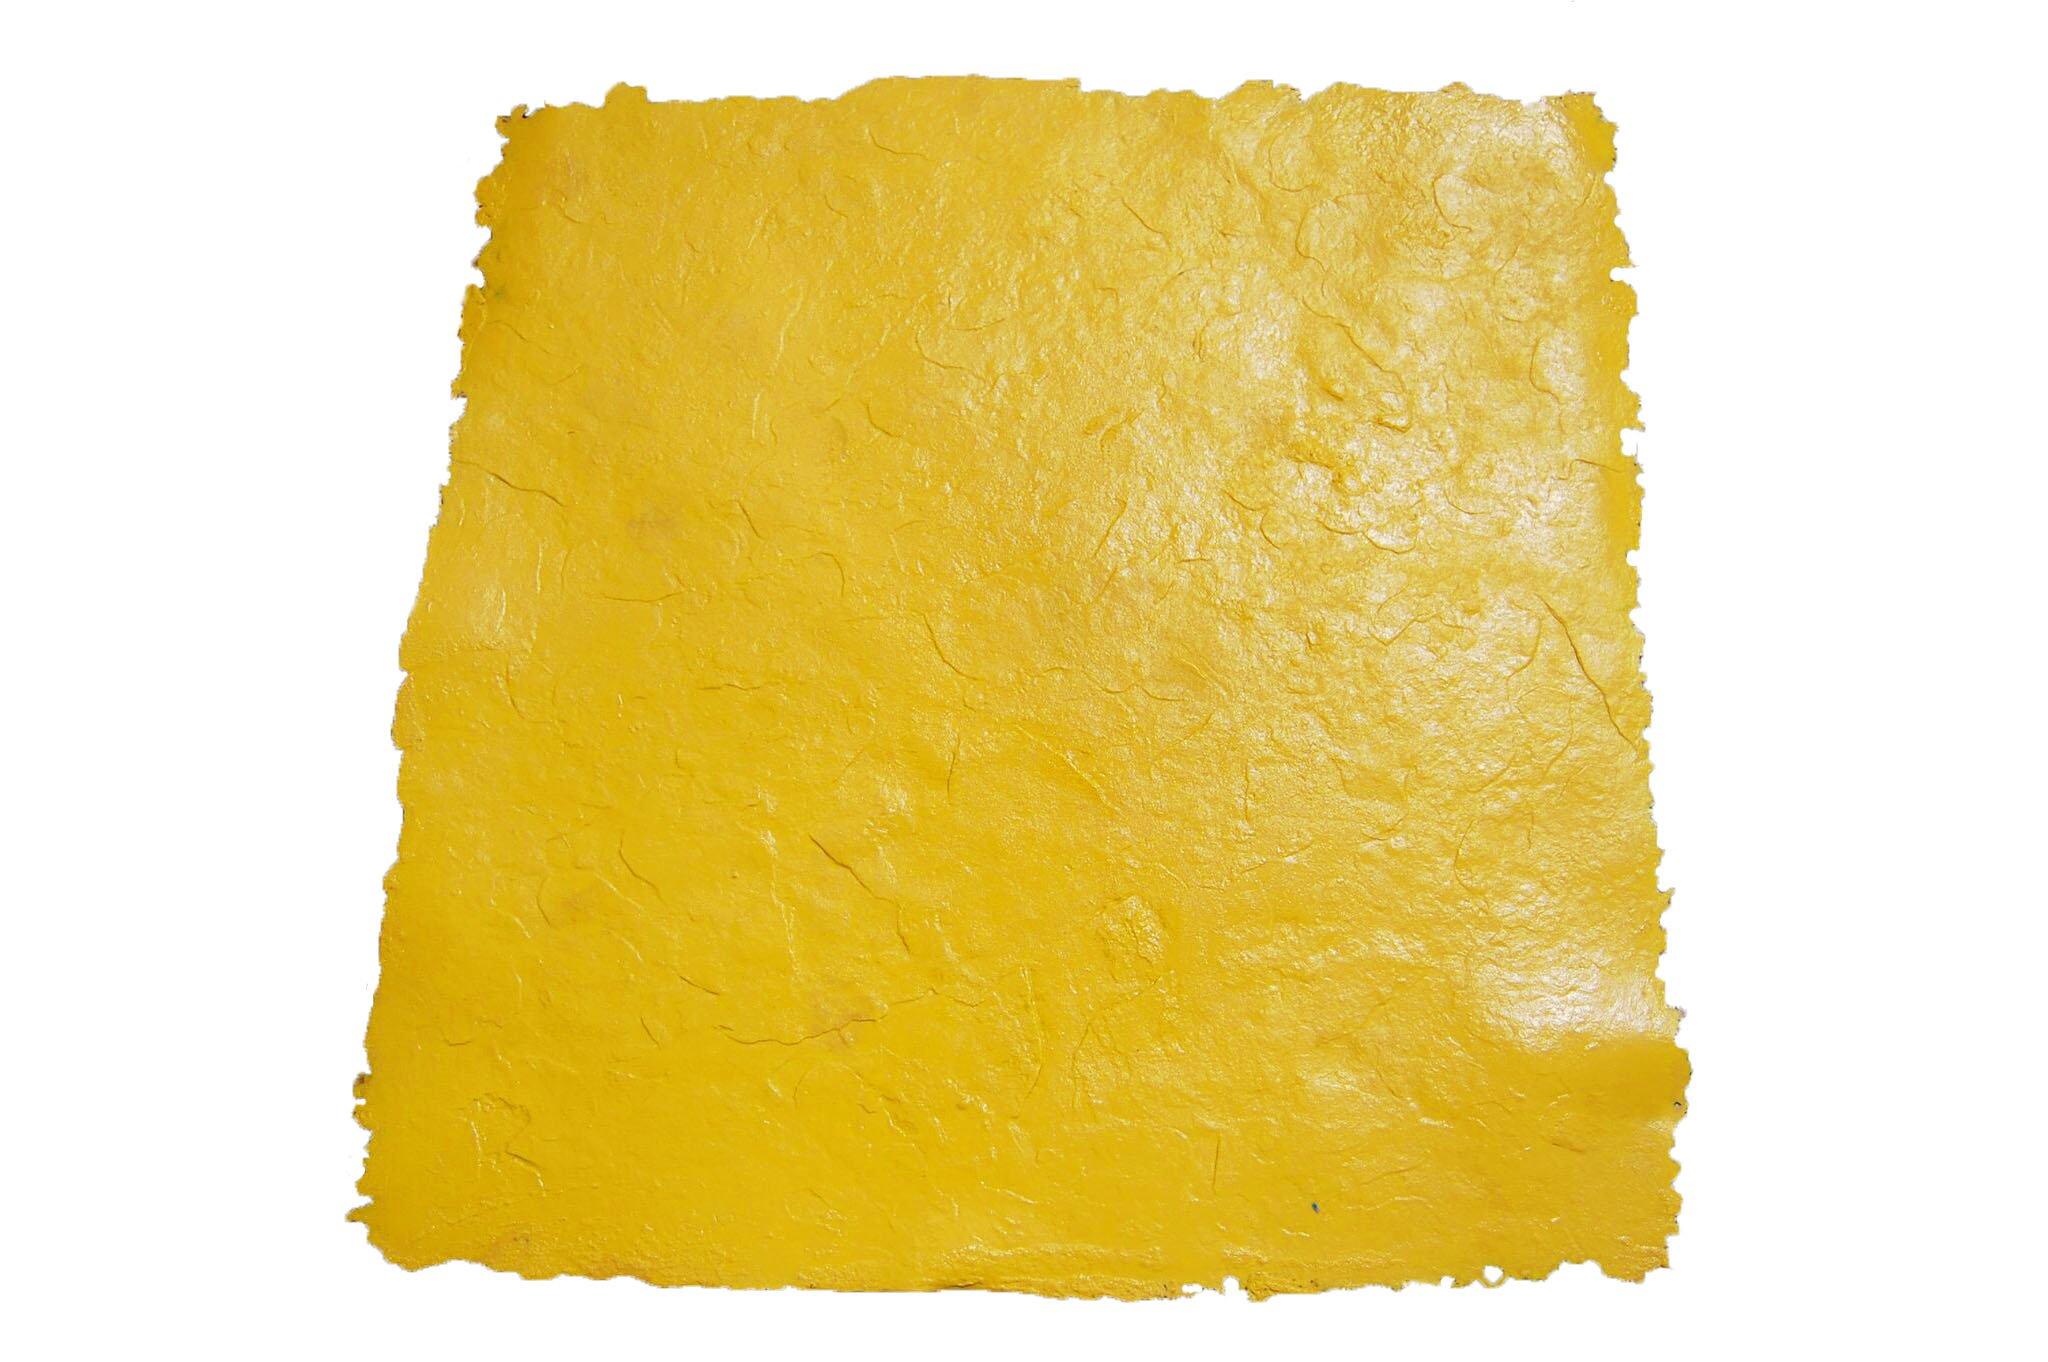 Colorado Sandstone (3 x 3 ft) Single Concrete Seamless Texture Skin Stamp Mat